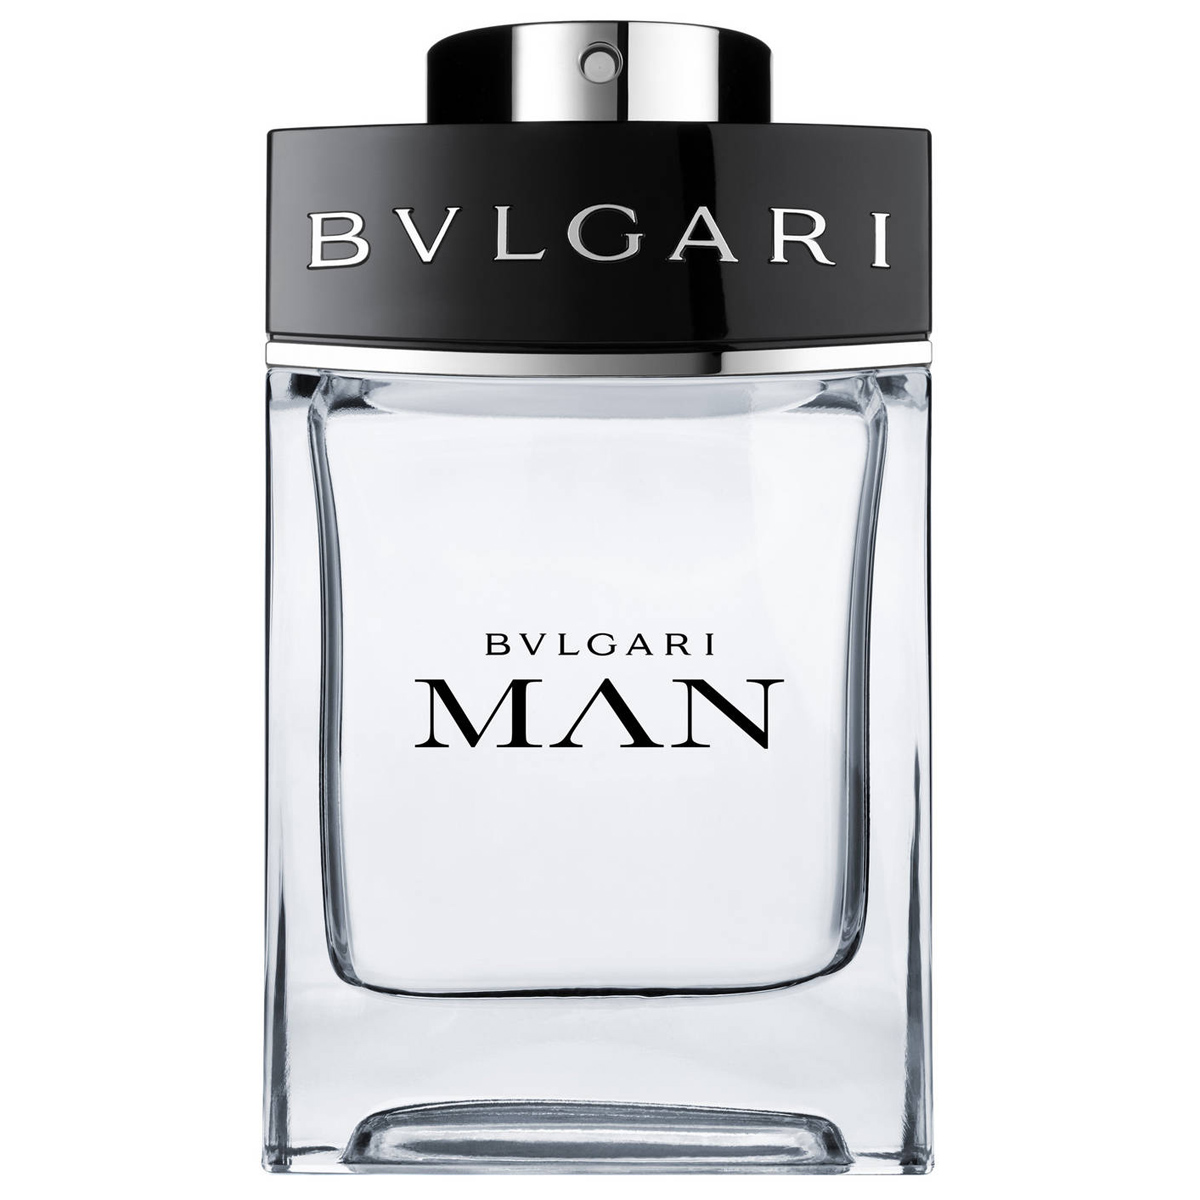 Eau de Toilette Bvlgari Man - BVLGARI